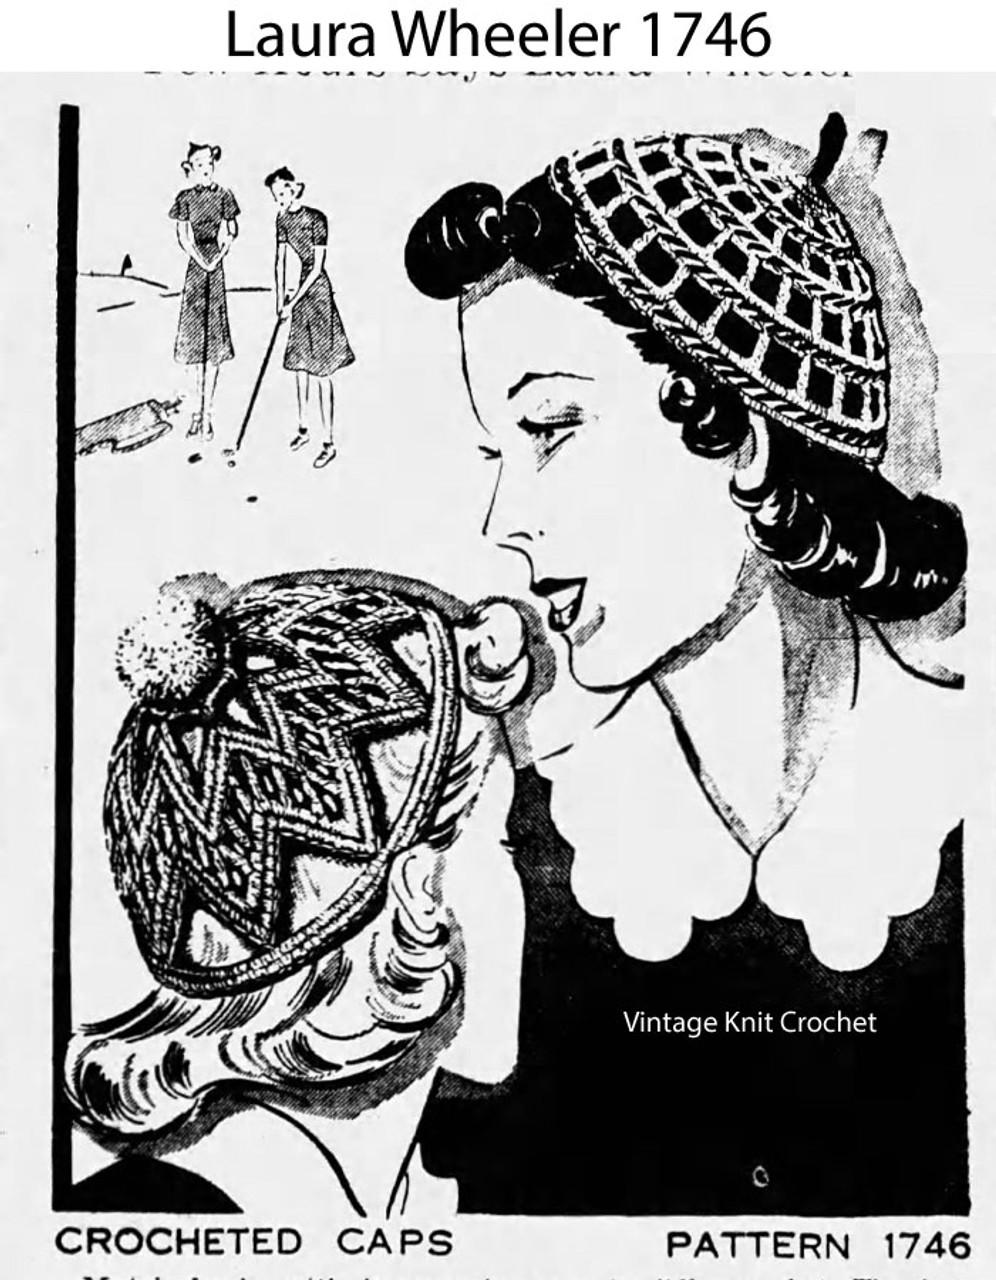 Vintage Crochet Beanie Caps Pattern, Laura Wheeler 1746